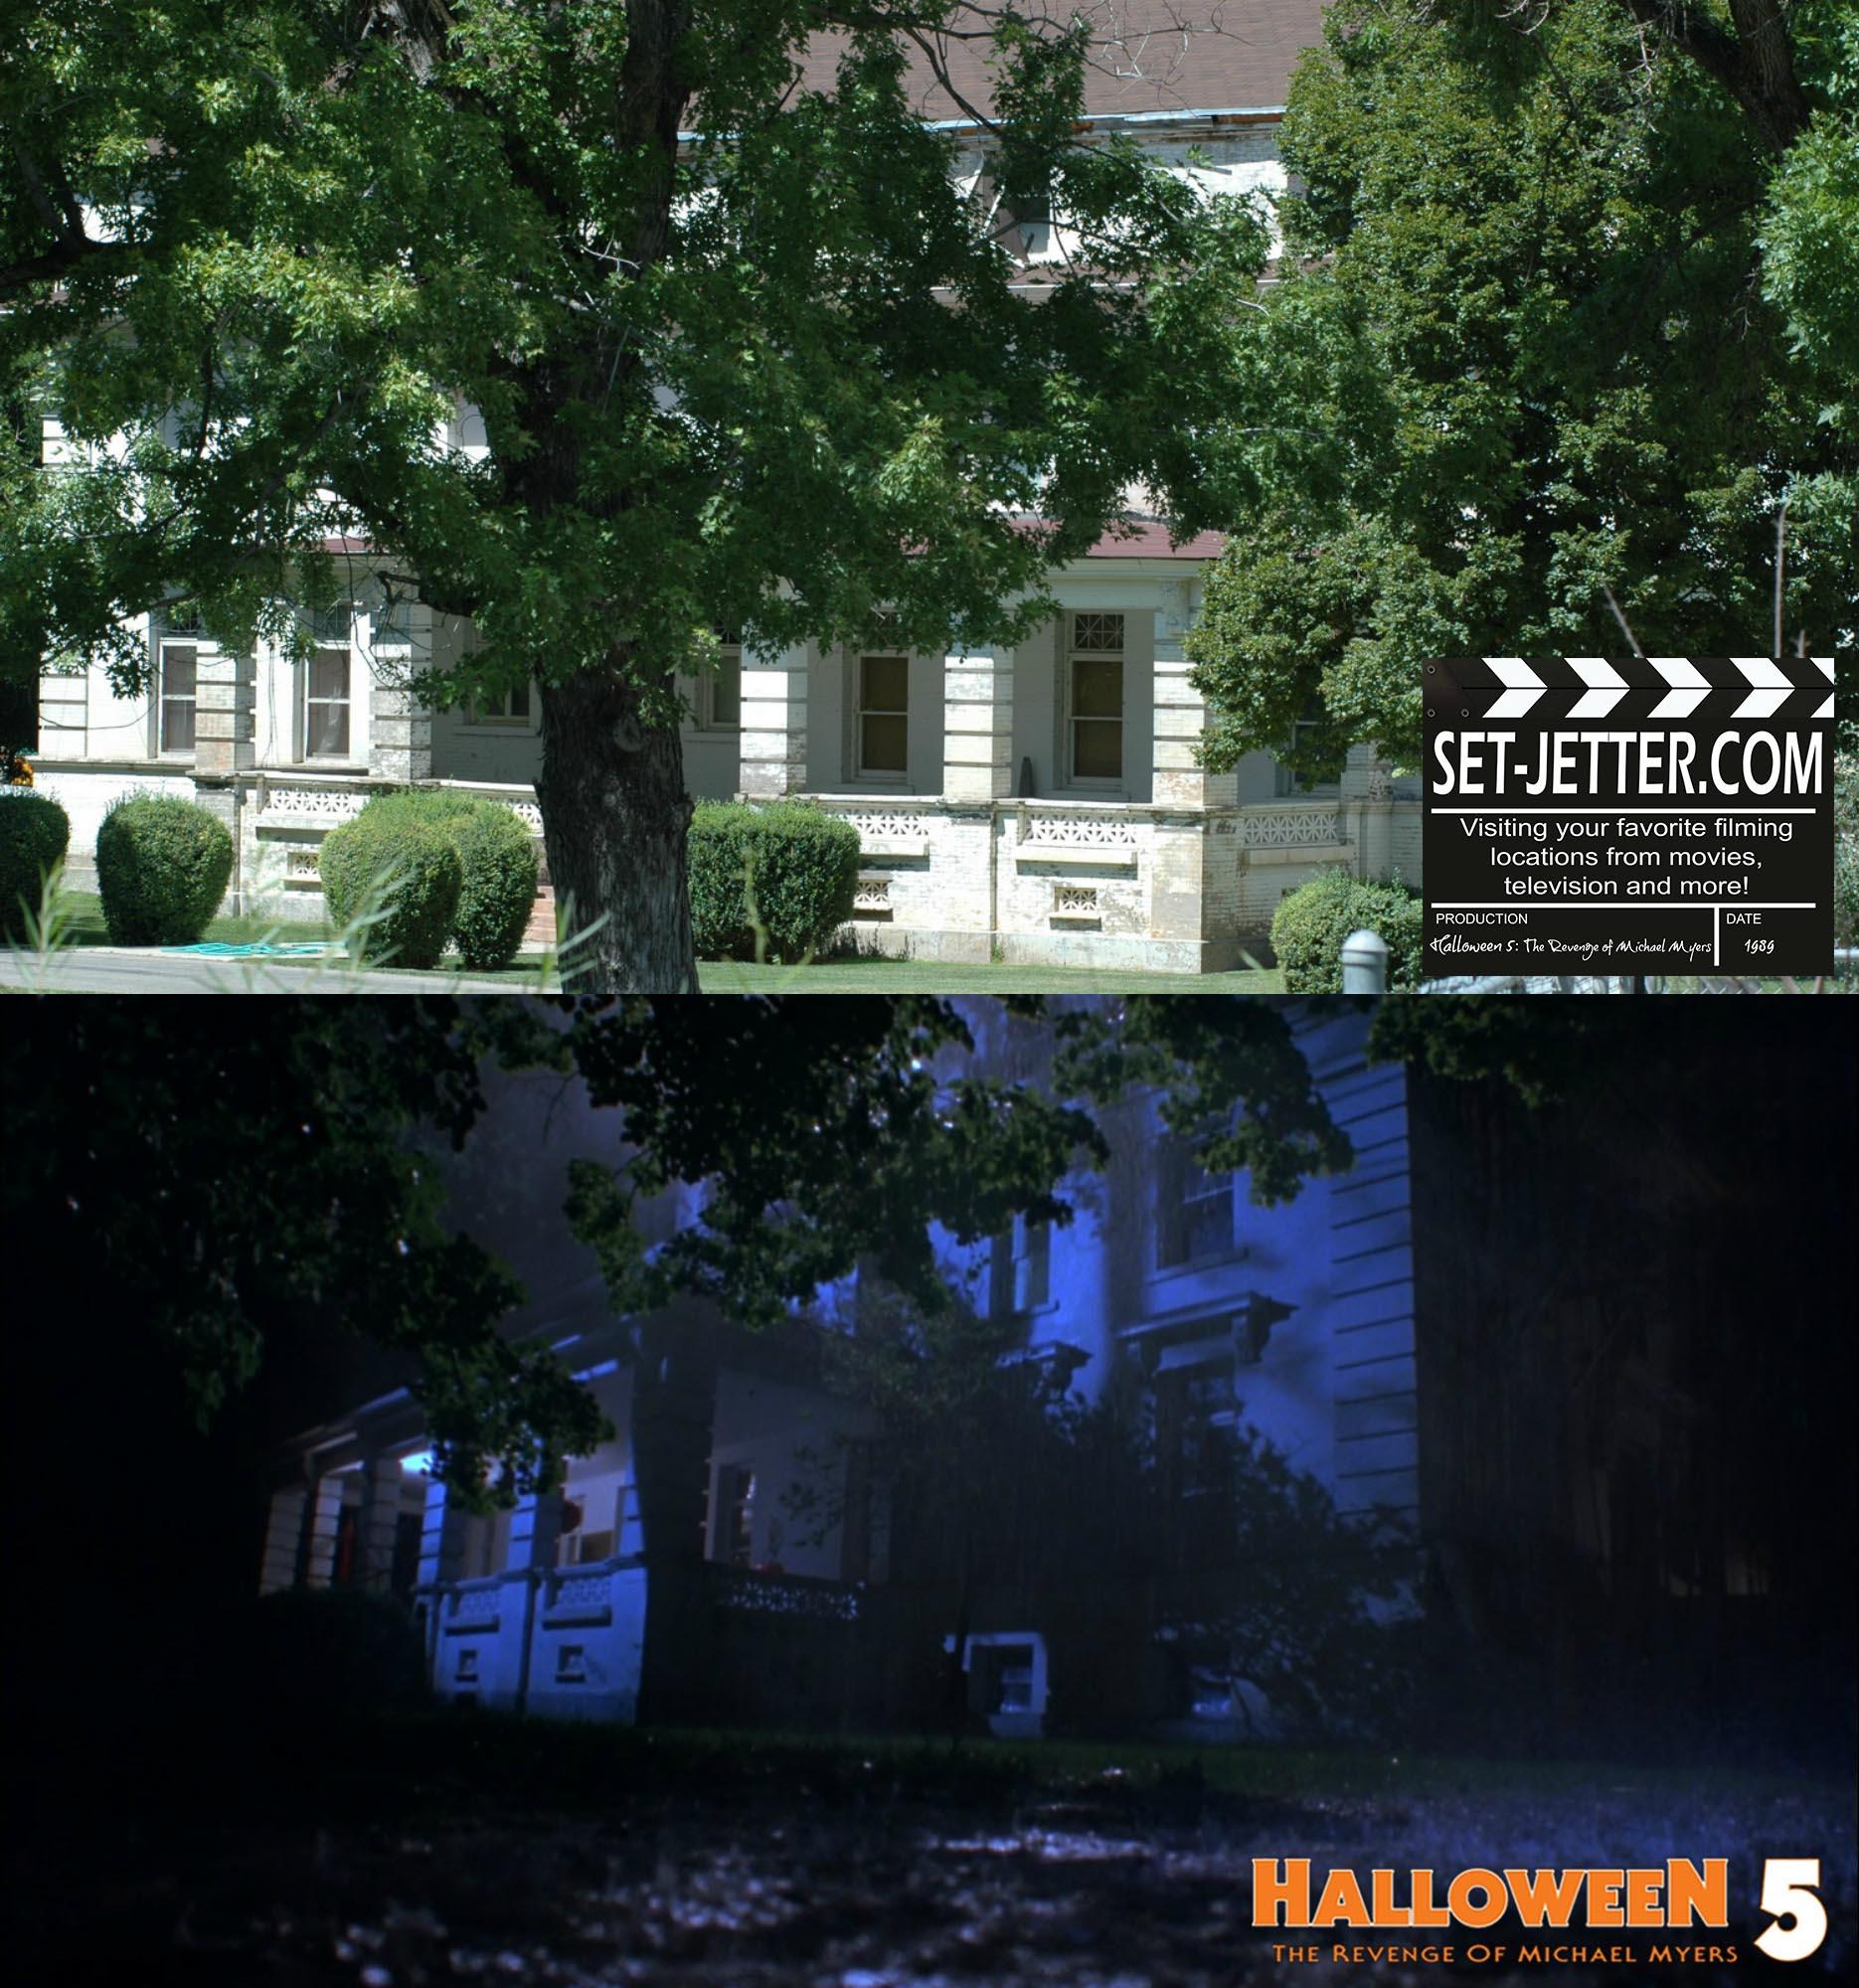 Halloween5-501.jpg